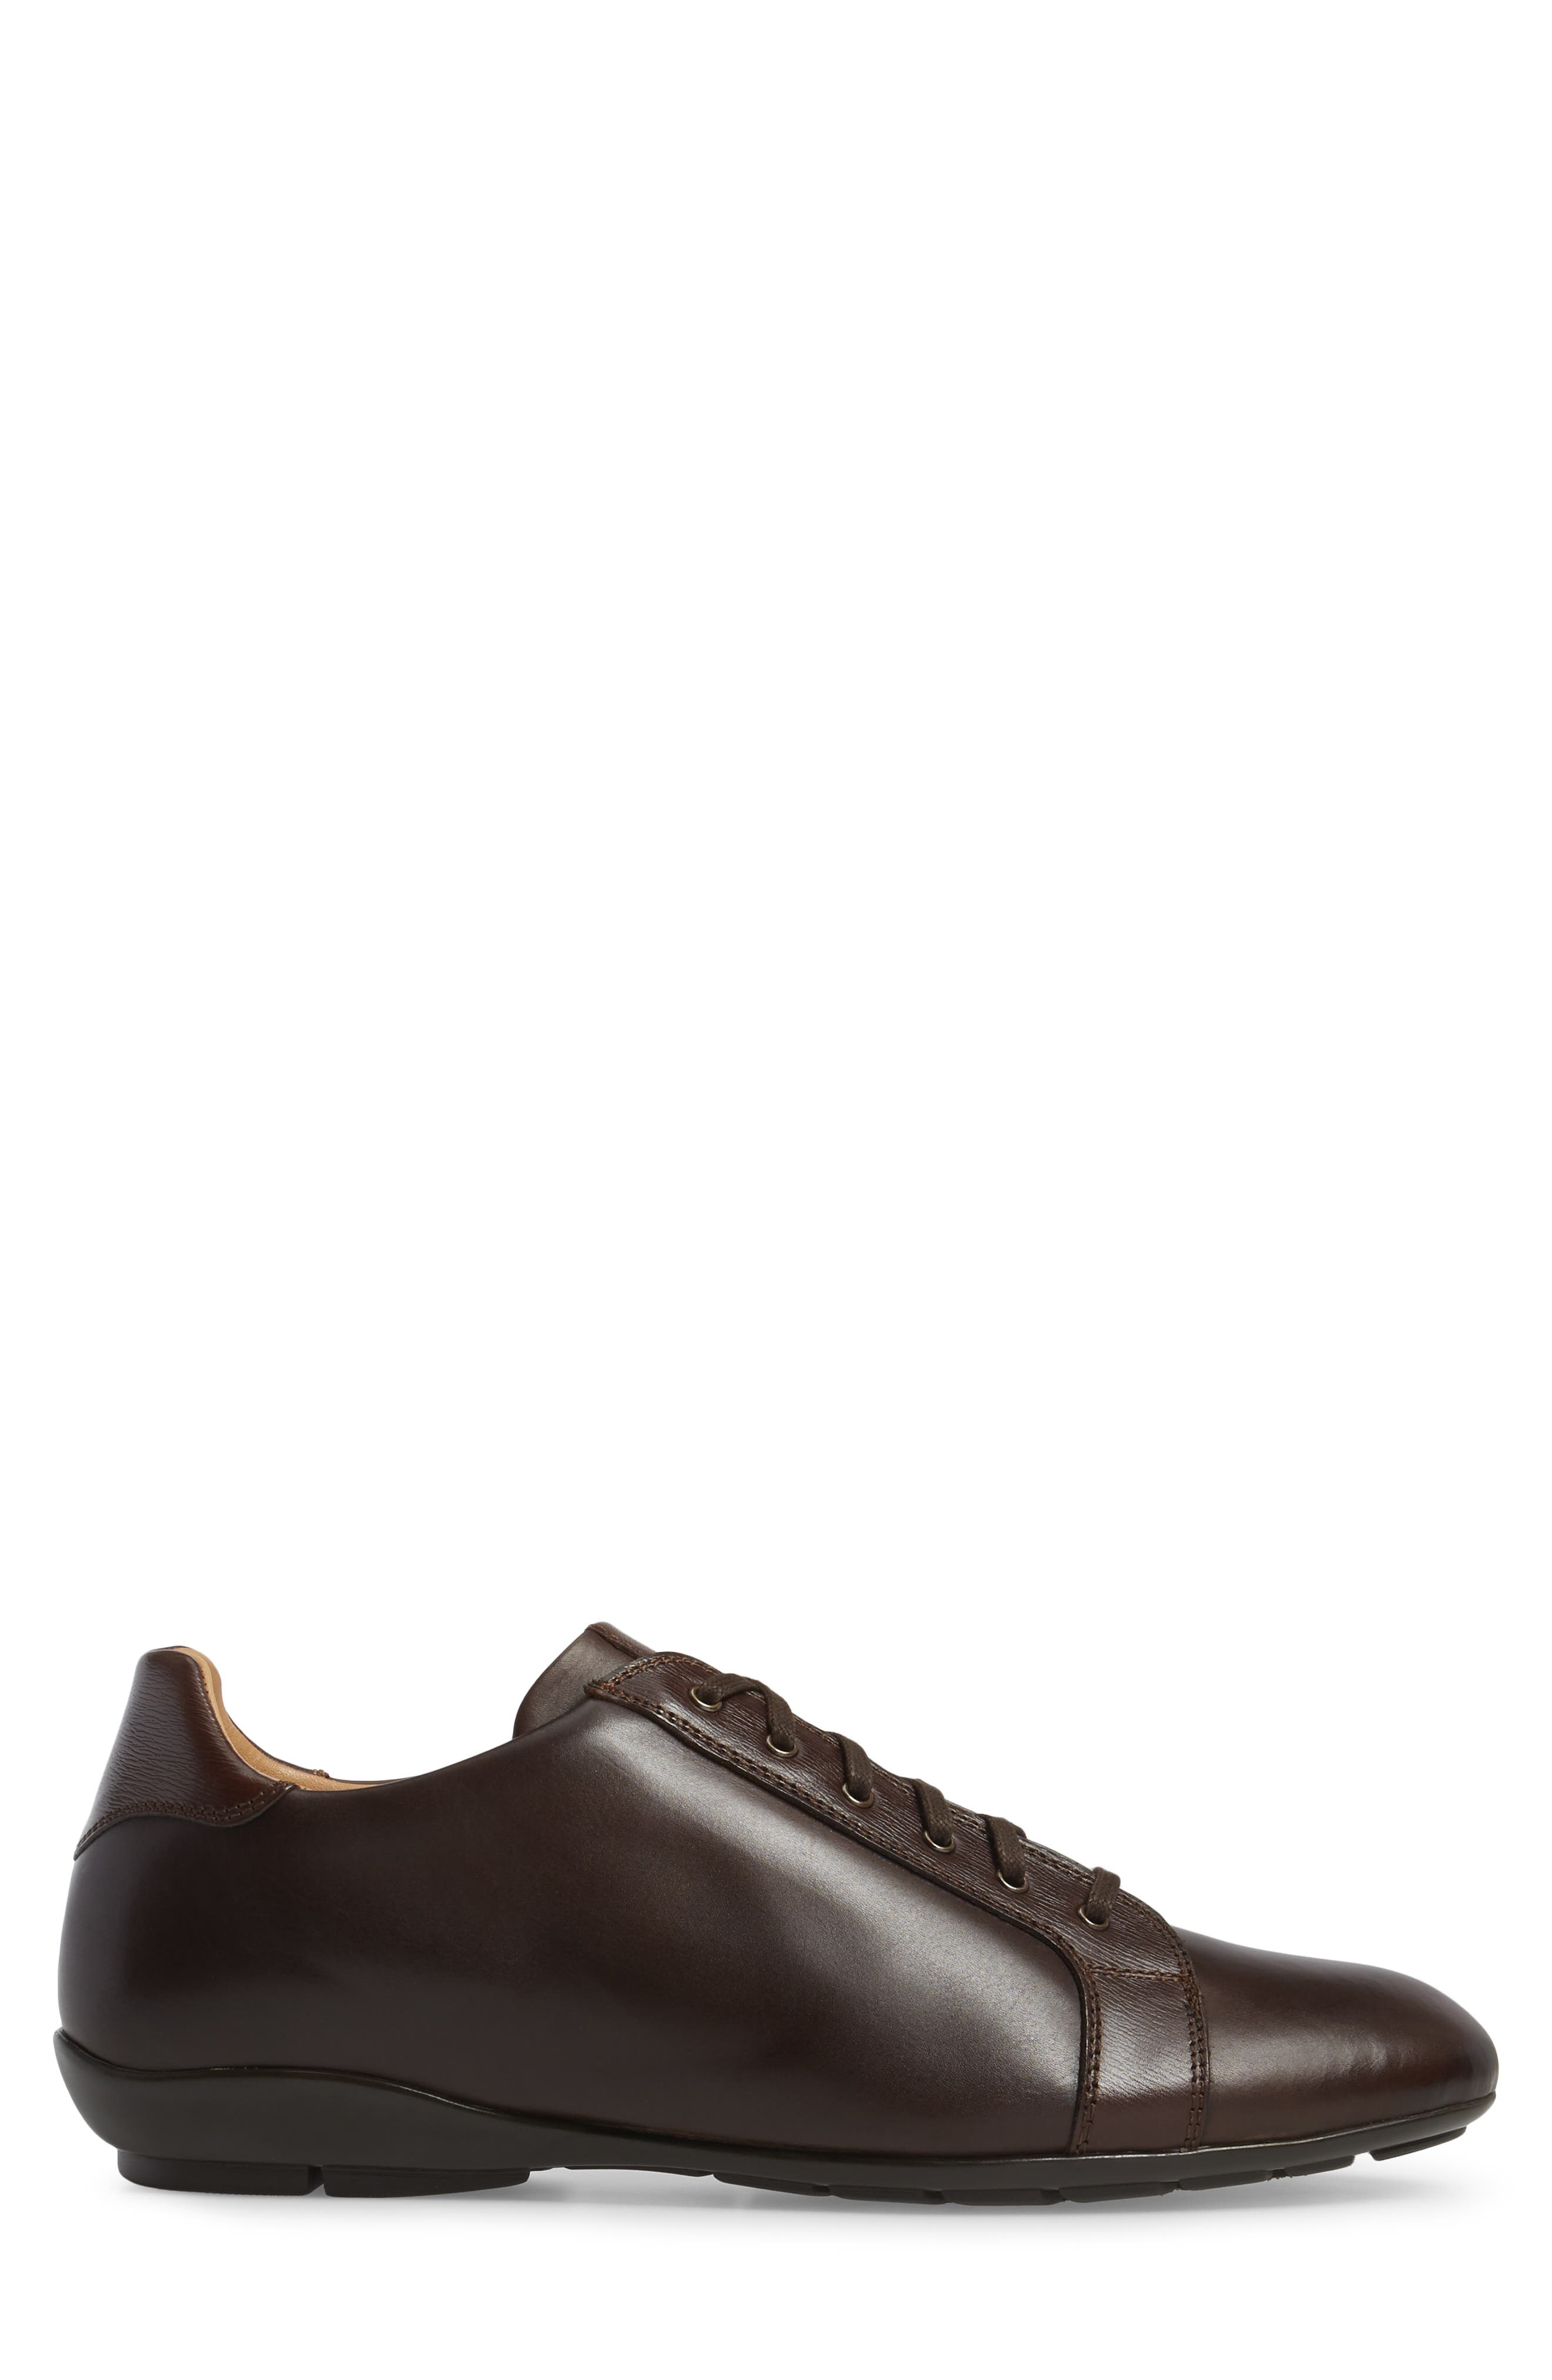 Ubrique Sneaker,                             Alternate thumbnail 3, color,                             Brown Multi Leather